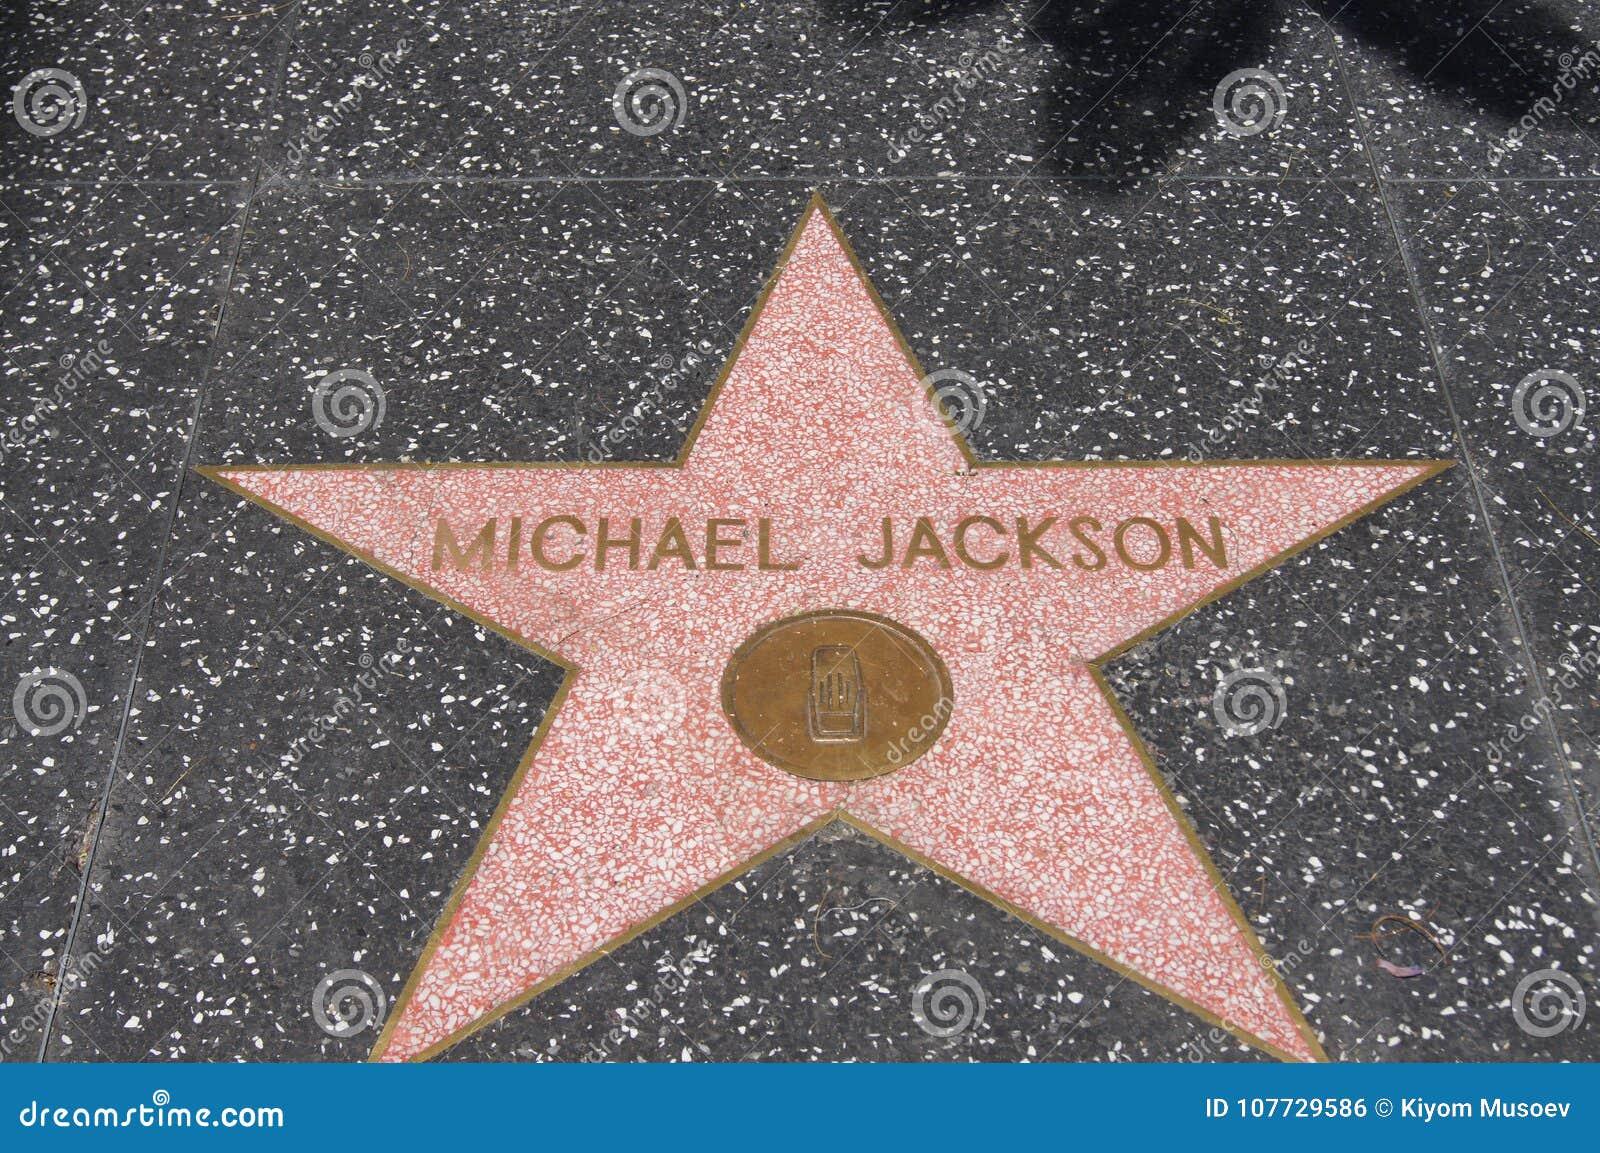 Michael Jackson, spacer sława